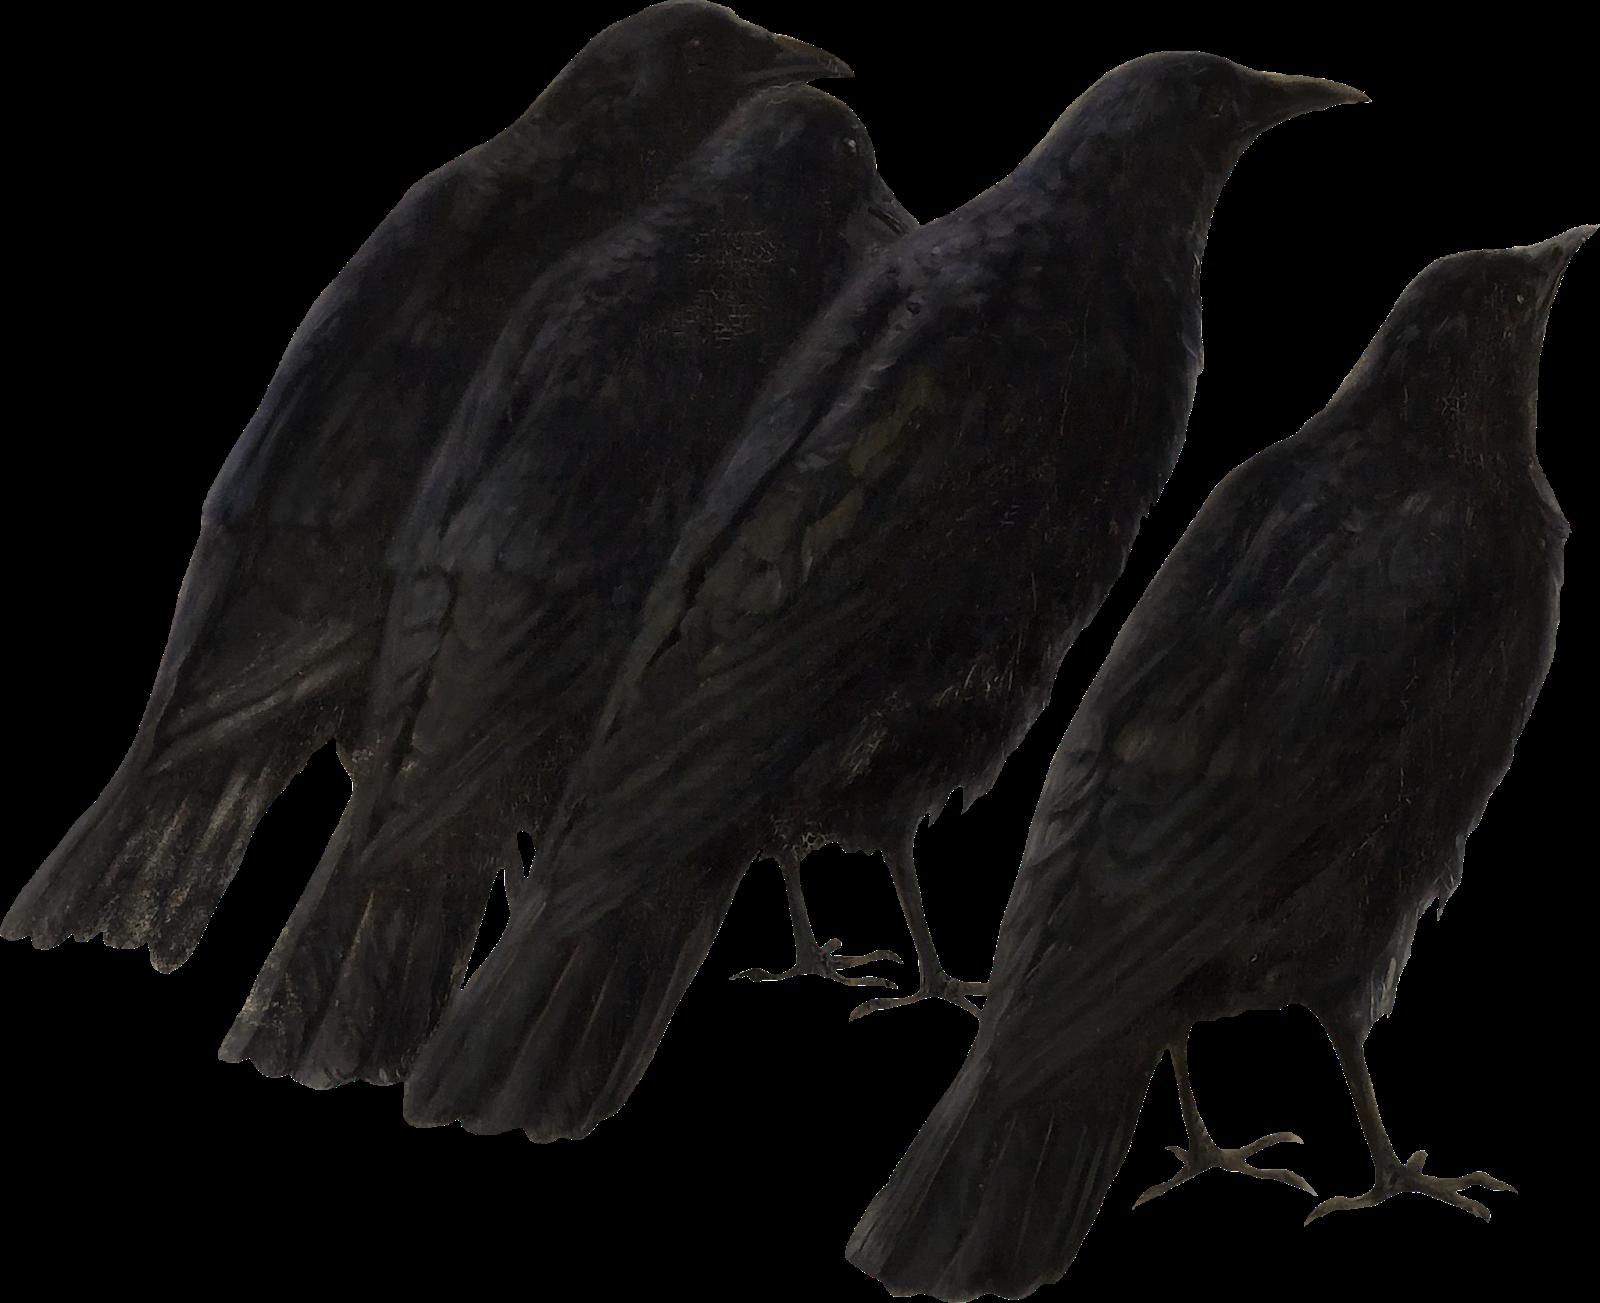 Itkupilli spiritusmortisunited crows png. Skeleton clipart crow